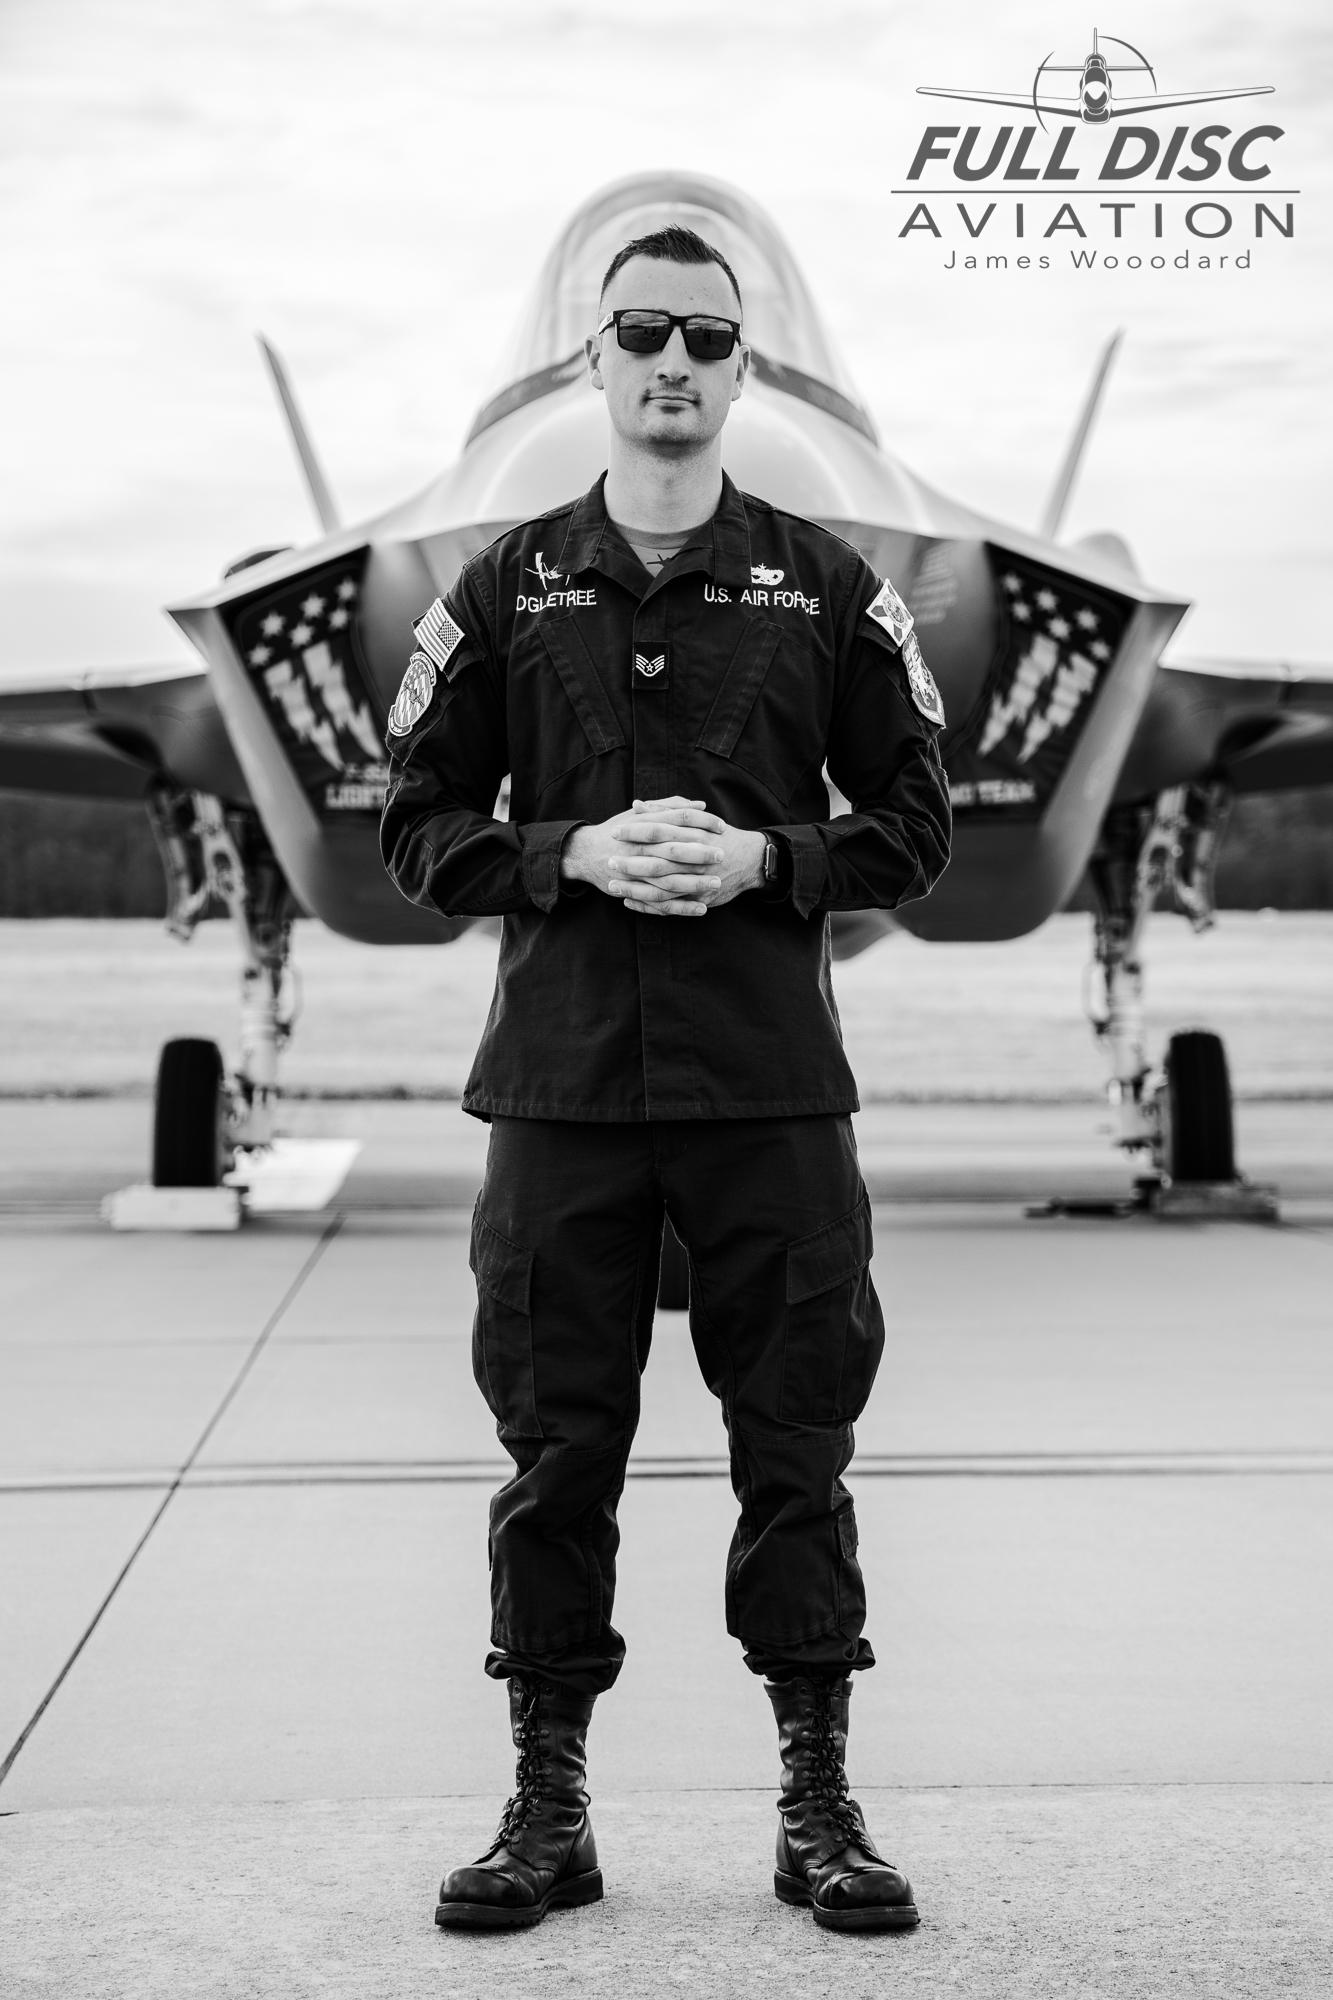 F35DemoTeam_FullDiscAviation_JamesWoodard-April 28, 2019-02.jpg